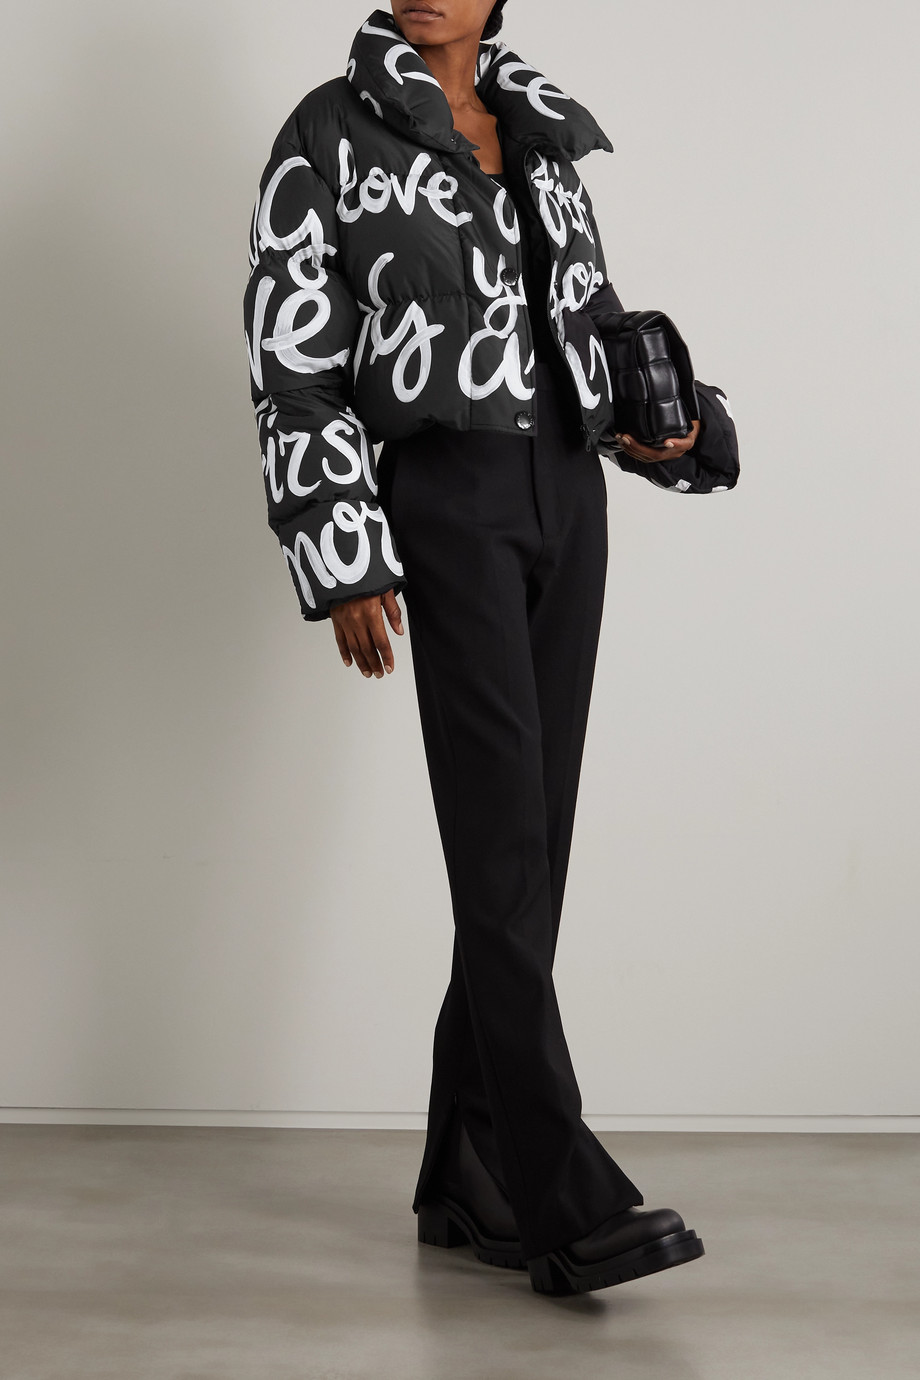 Dolce & Gabbana Doudoune raccourcie en tissu technique imprimé